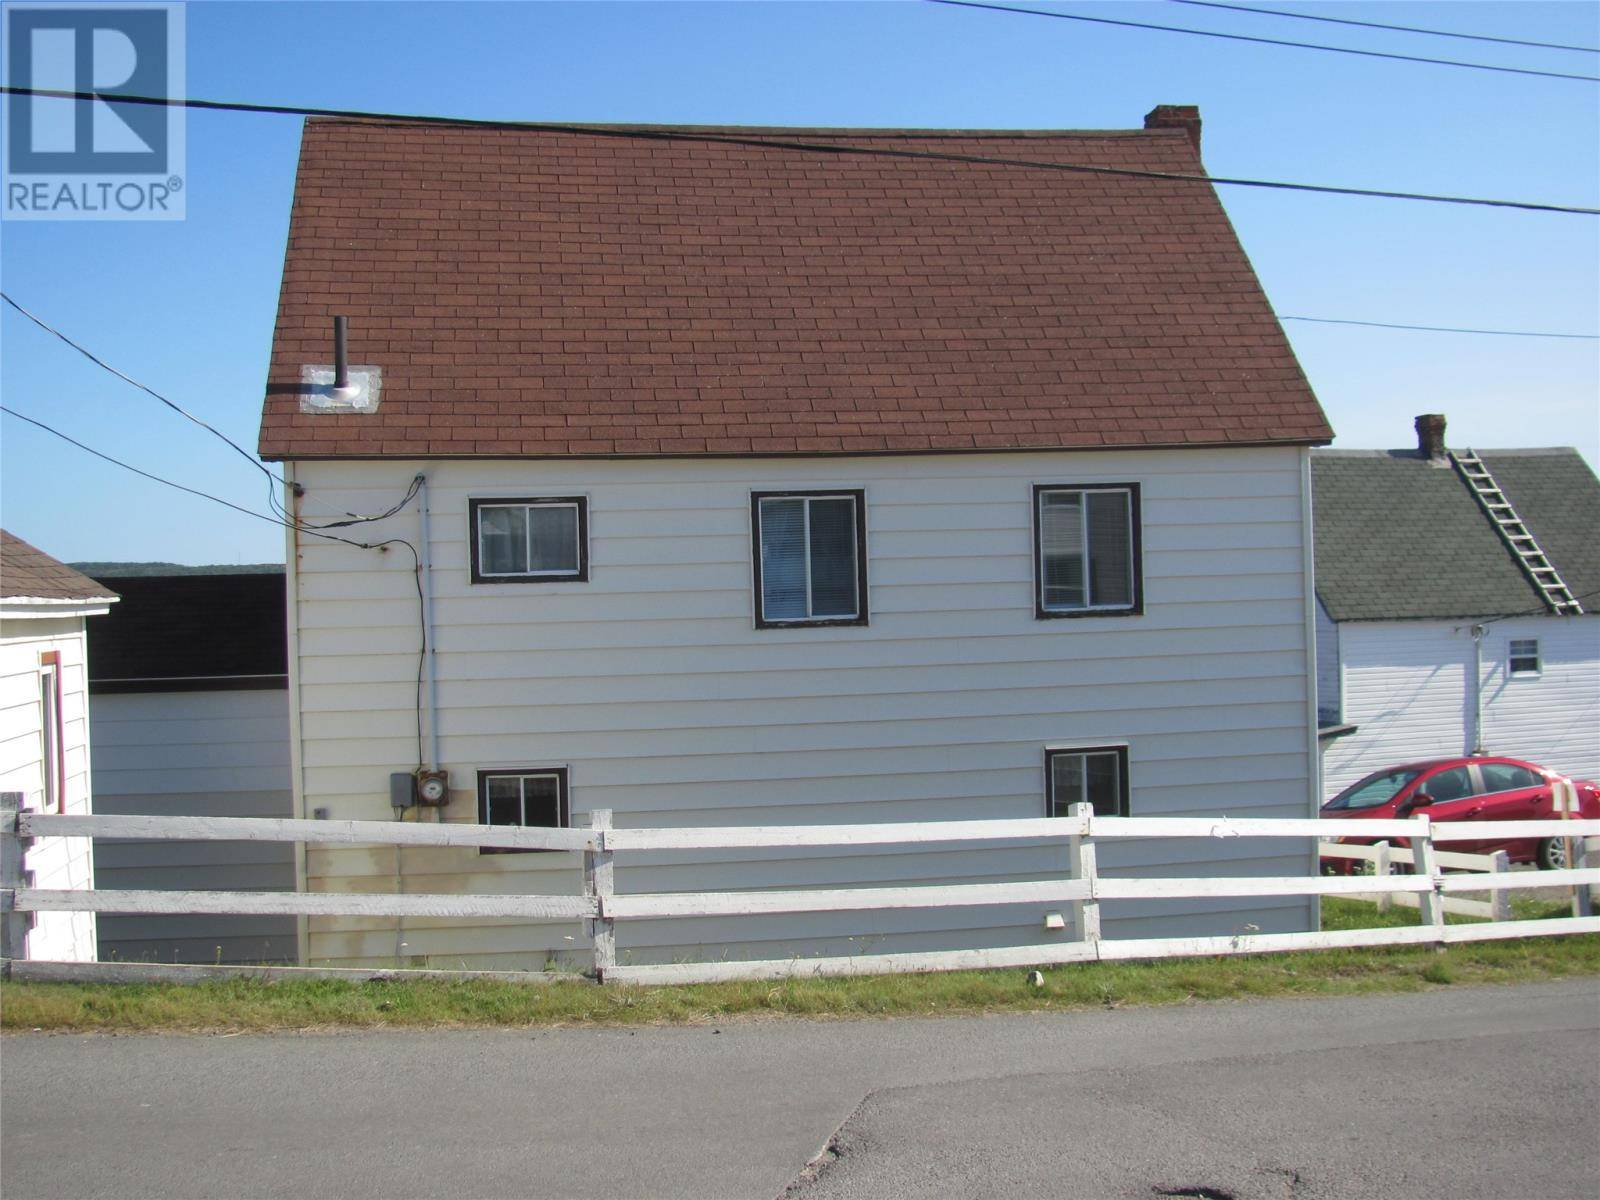 House for sale at 91 Red Point Rd Bonavista Newfoundland - MLS: 1201339